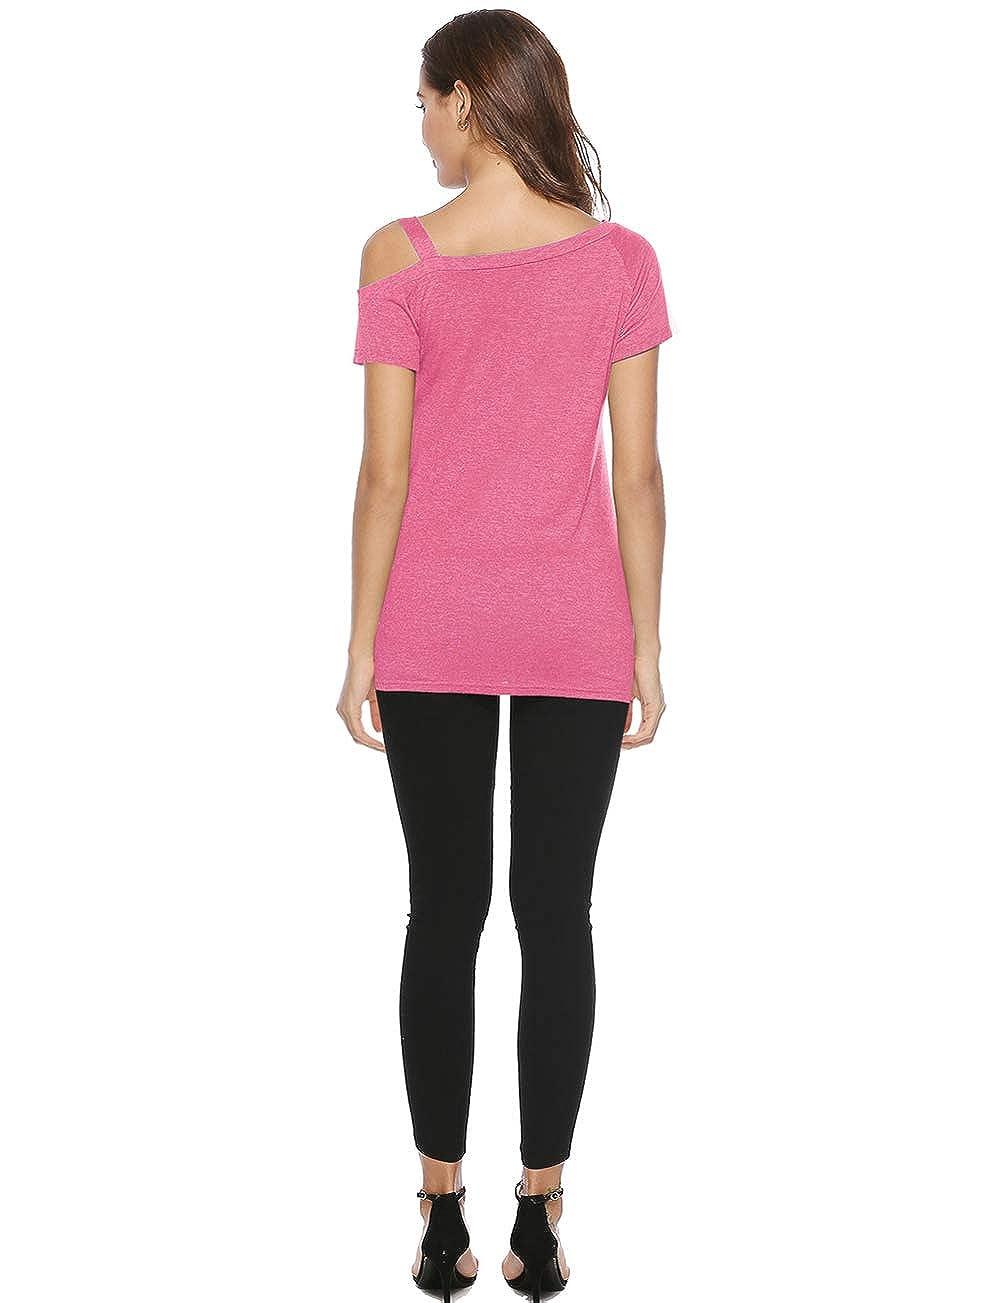 Dico Women Tops Short Sleeve T-Shirt Summer Tees Cotton Shirts Off Shoulder